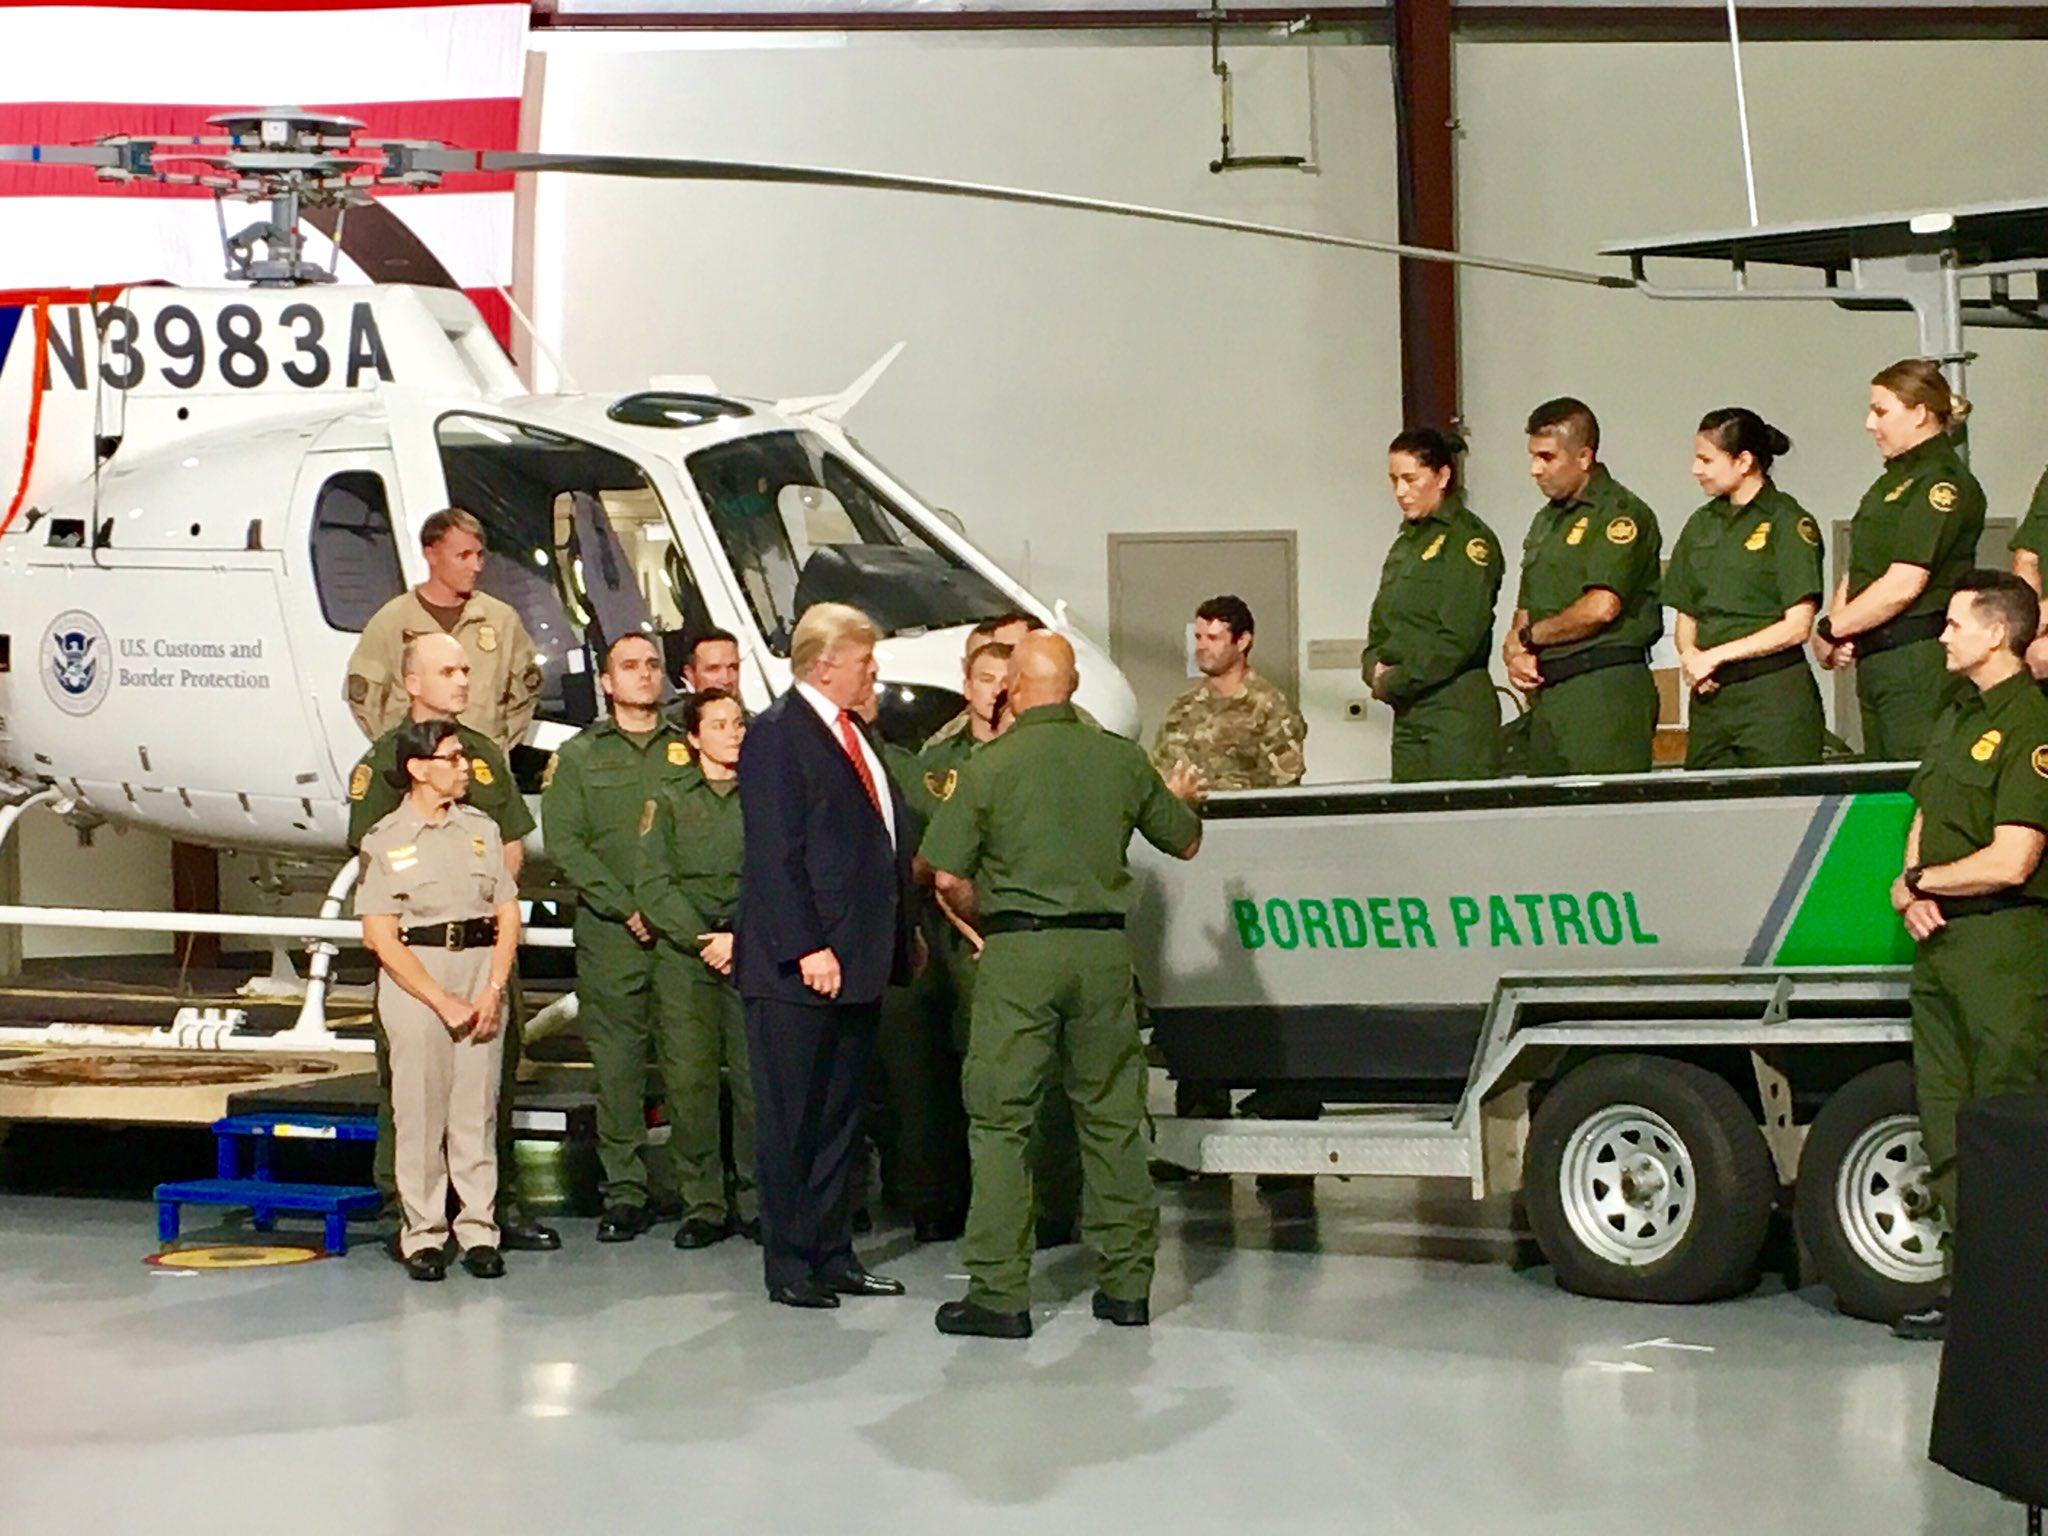 .@POTUS visits w/ @CustomsBorder and @ICEgov agents in Yuma, AZ. https://t.co/SaJ0ij4rJf